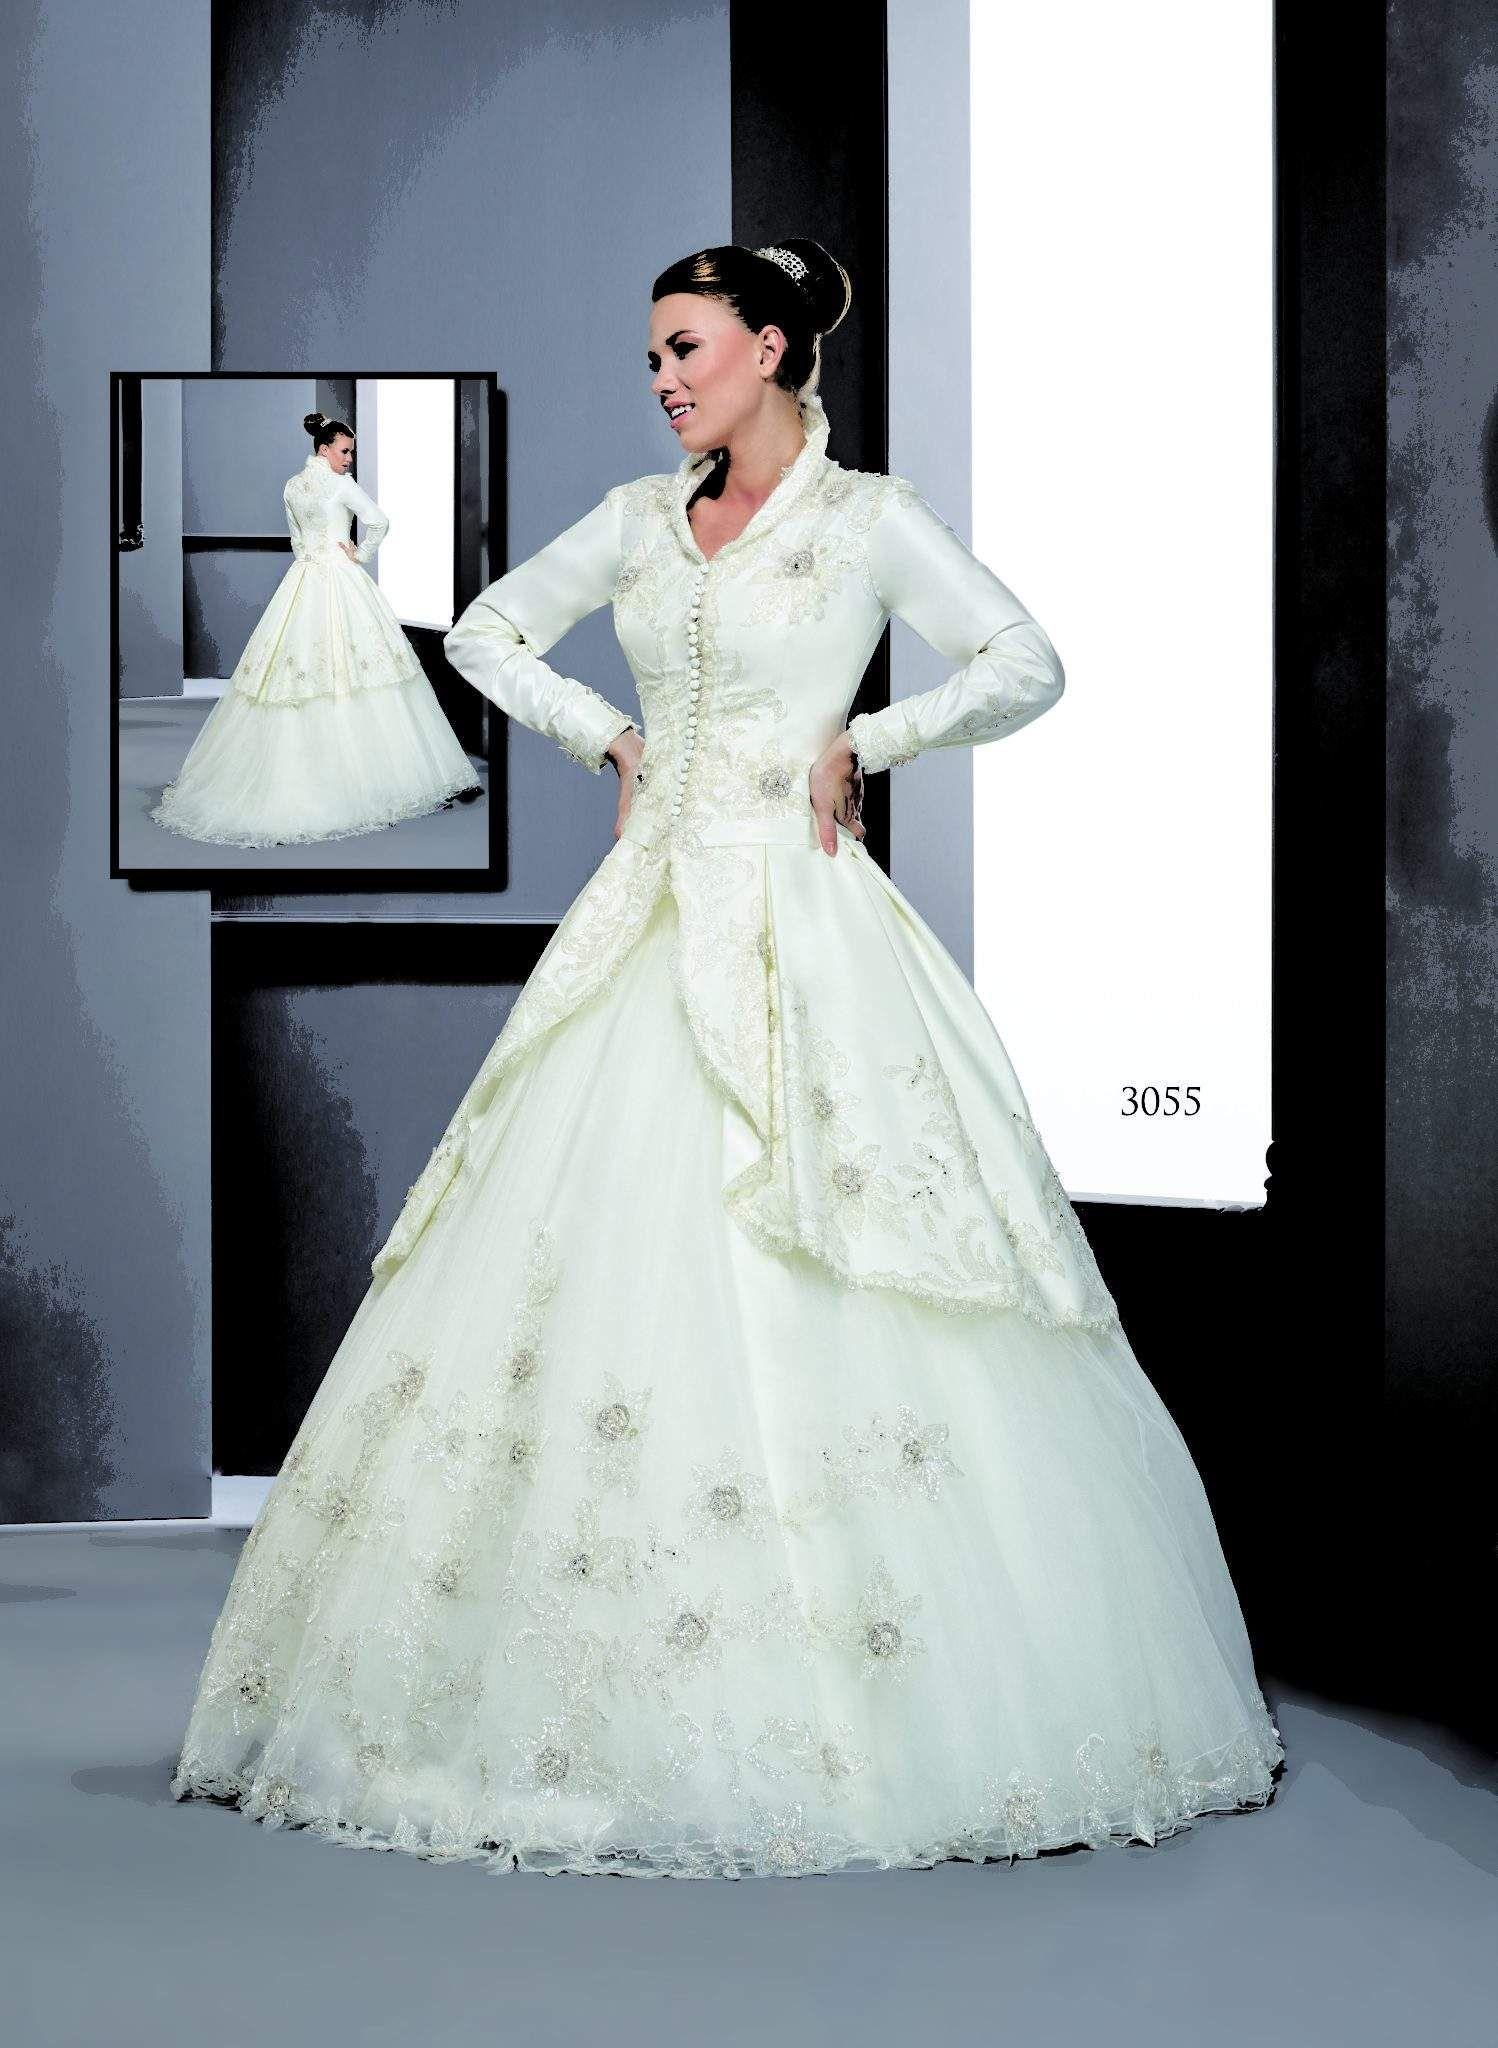 ad325eabf8 Long Sleeve Wedding Dress Coats - Darius Cordell Fashion Ltd | all ...